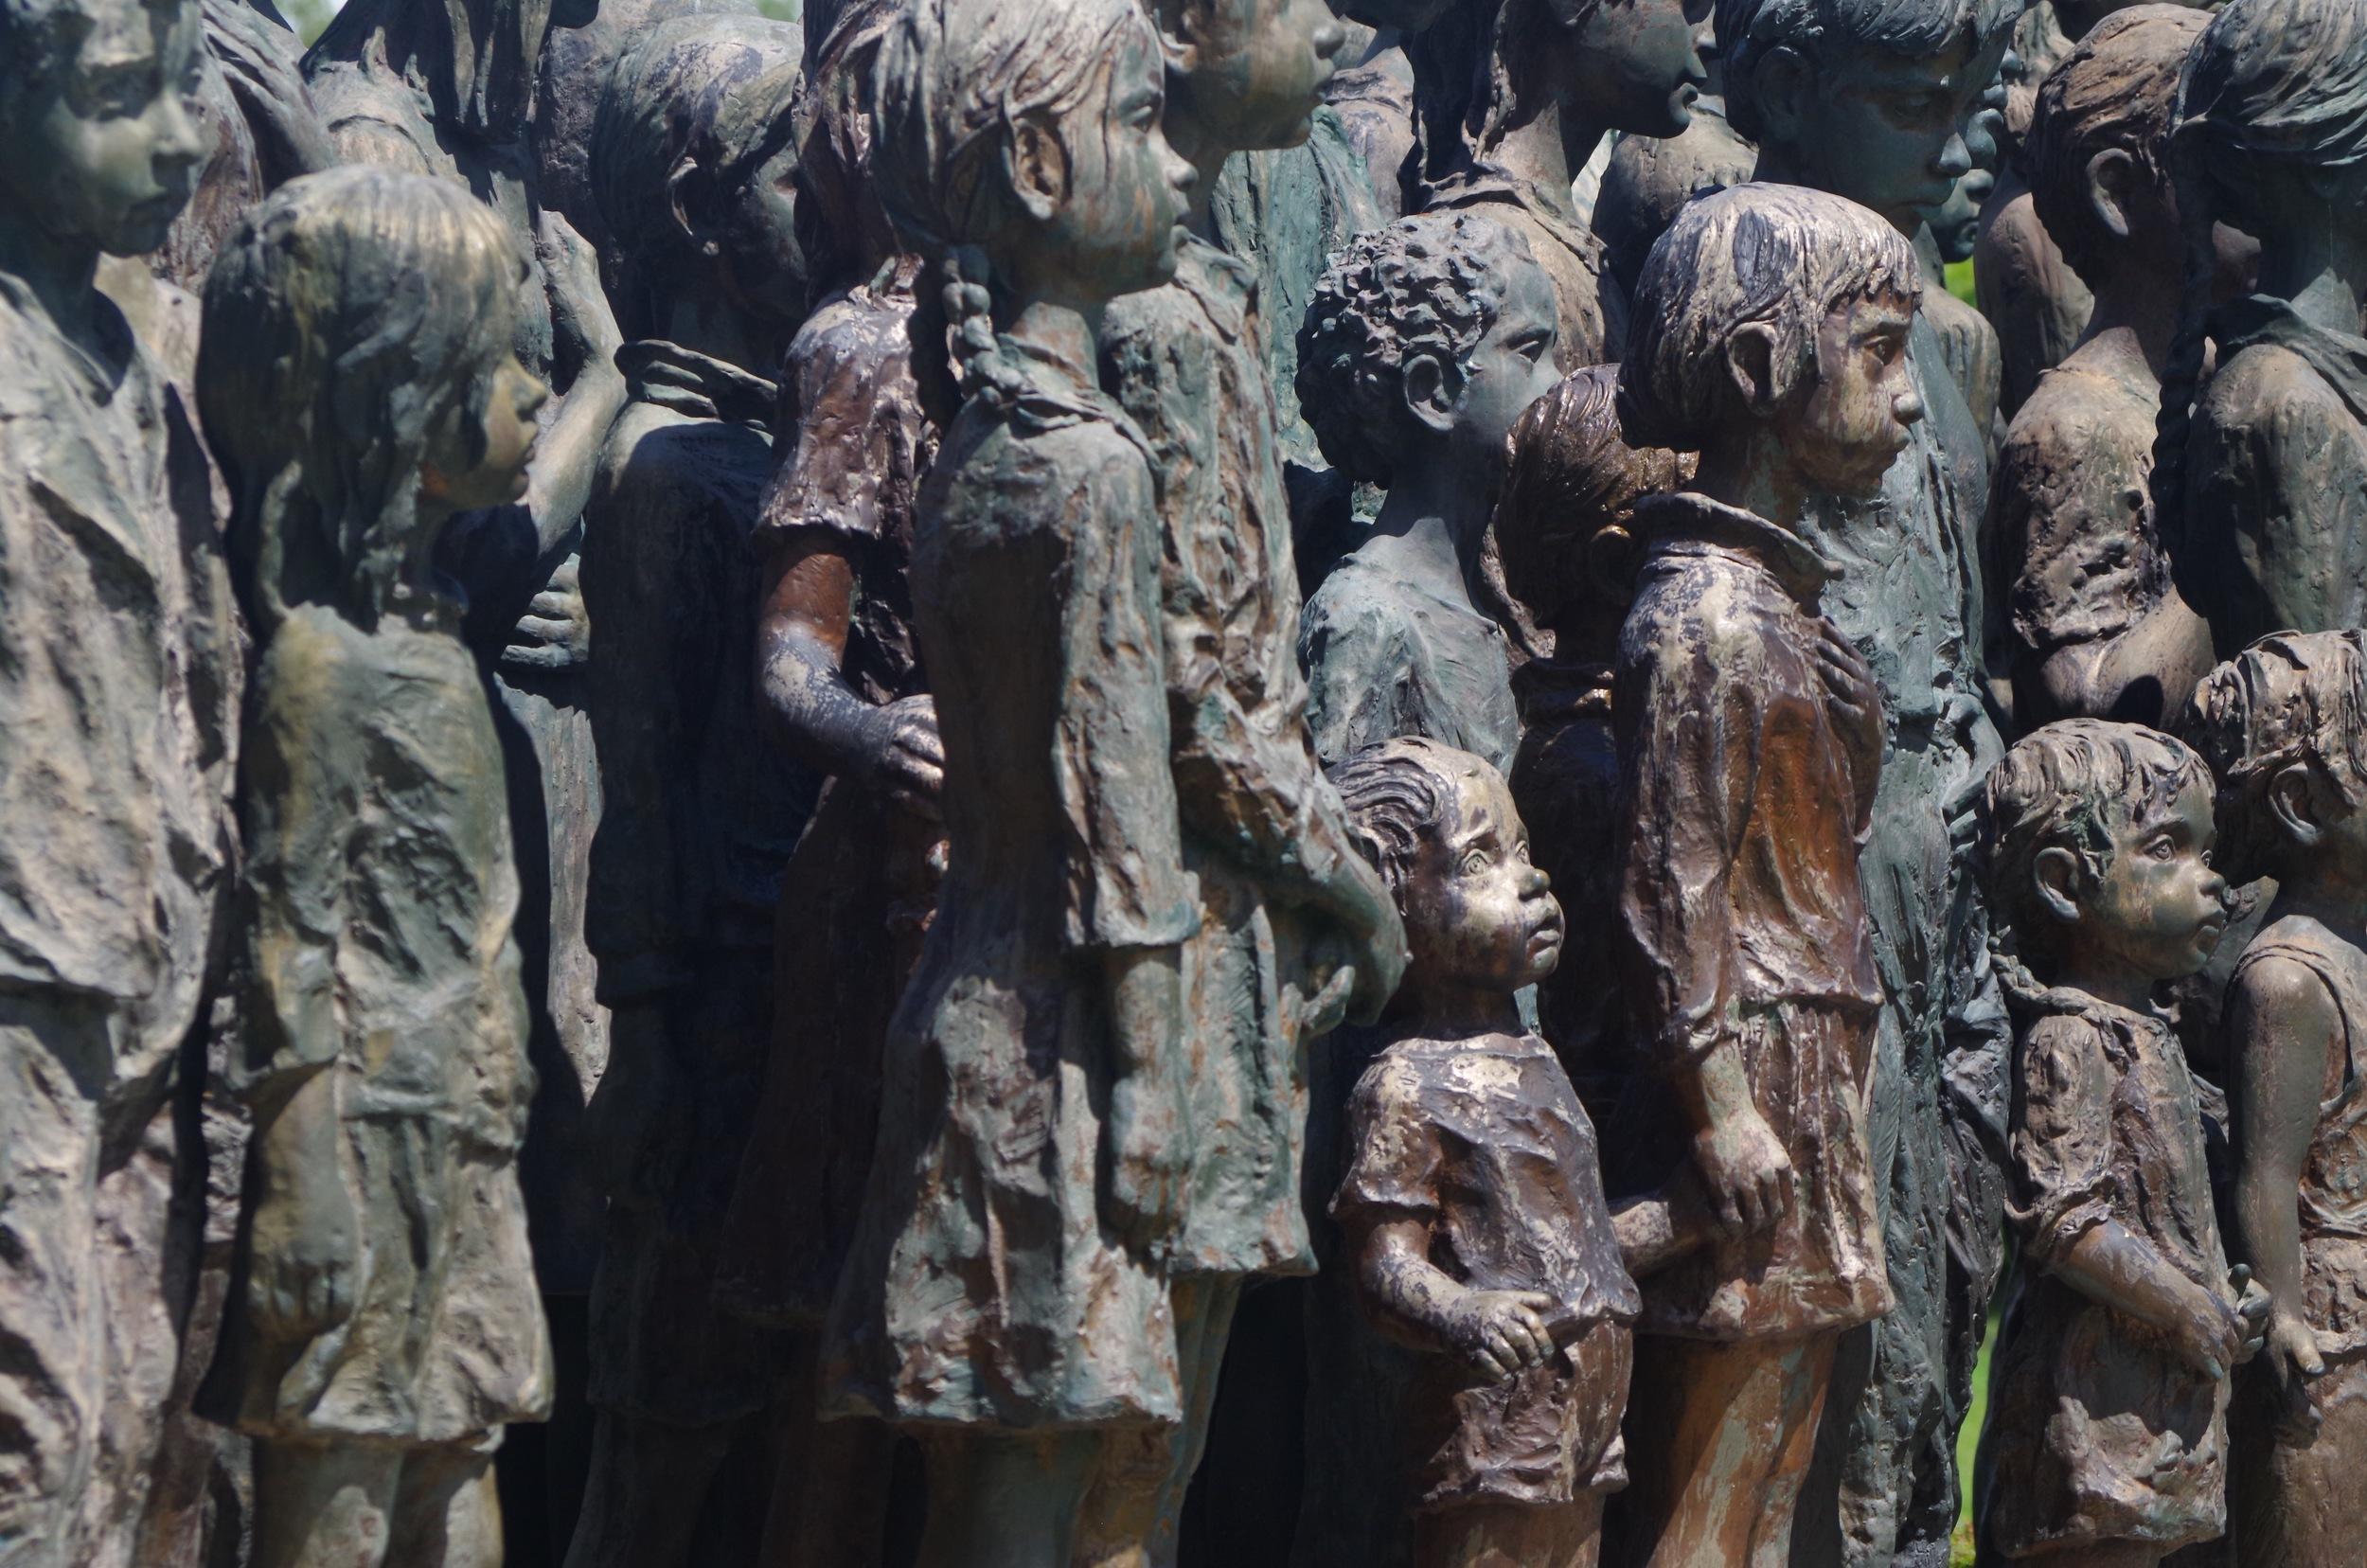 Memorial to the children of Lidice